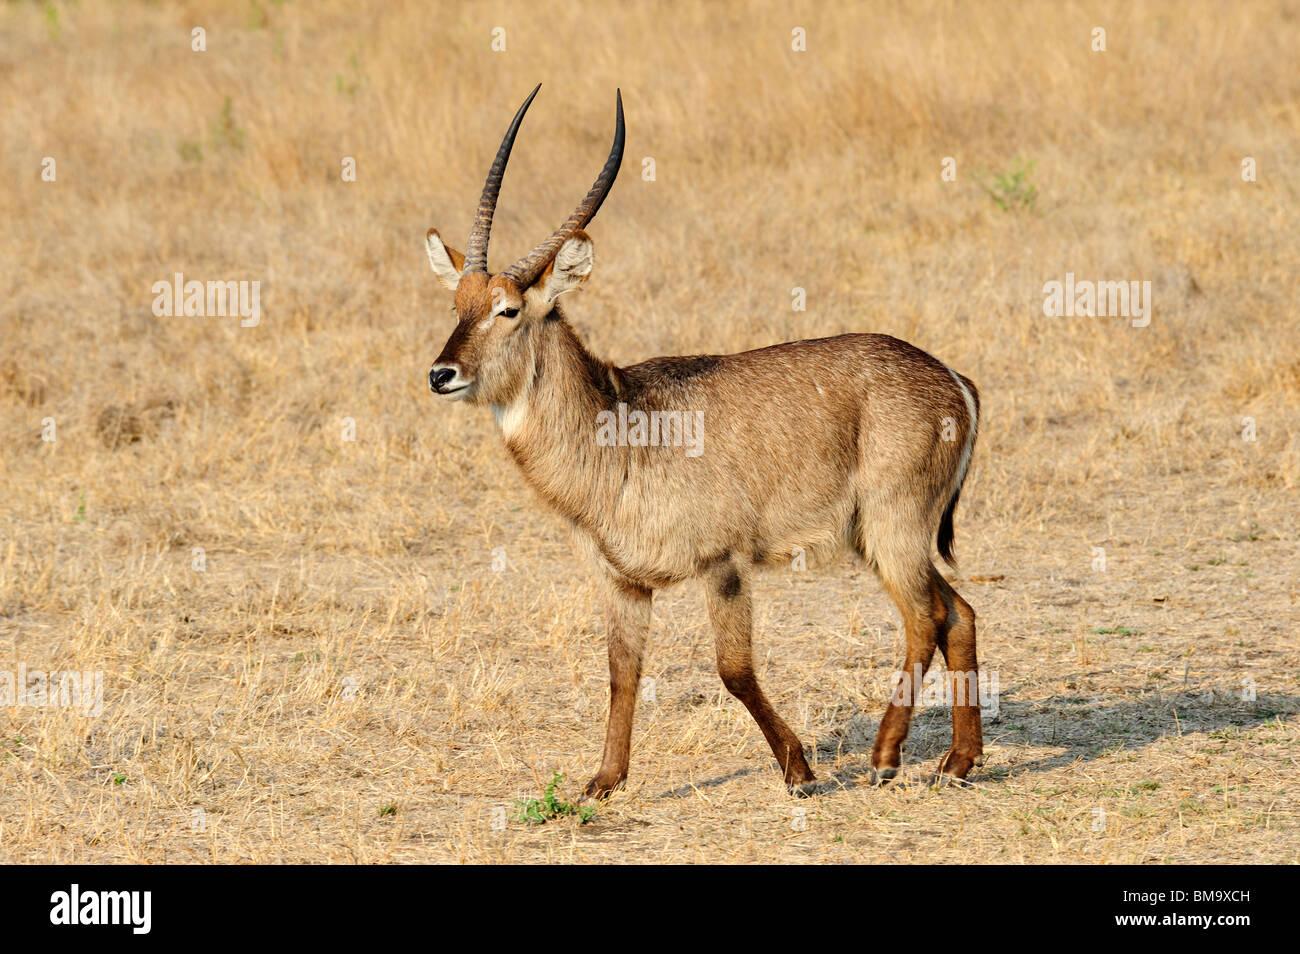 Macho solitario antelope Sabi Sand Private Game Reserve en la provincia de Mpumalanga, Sudáfrica Foto de stock